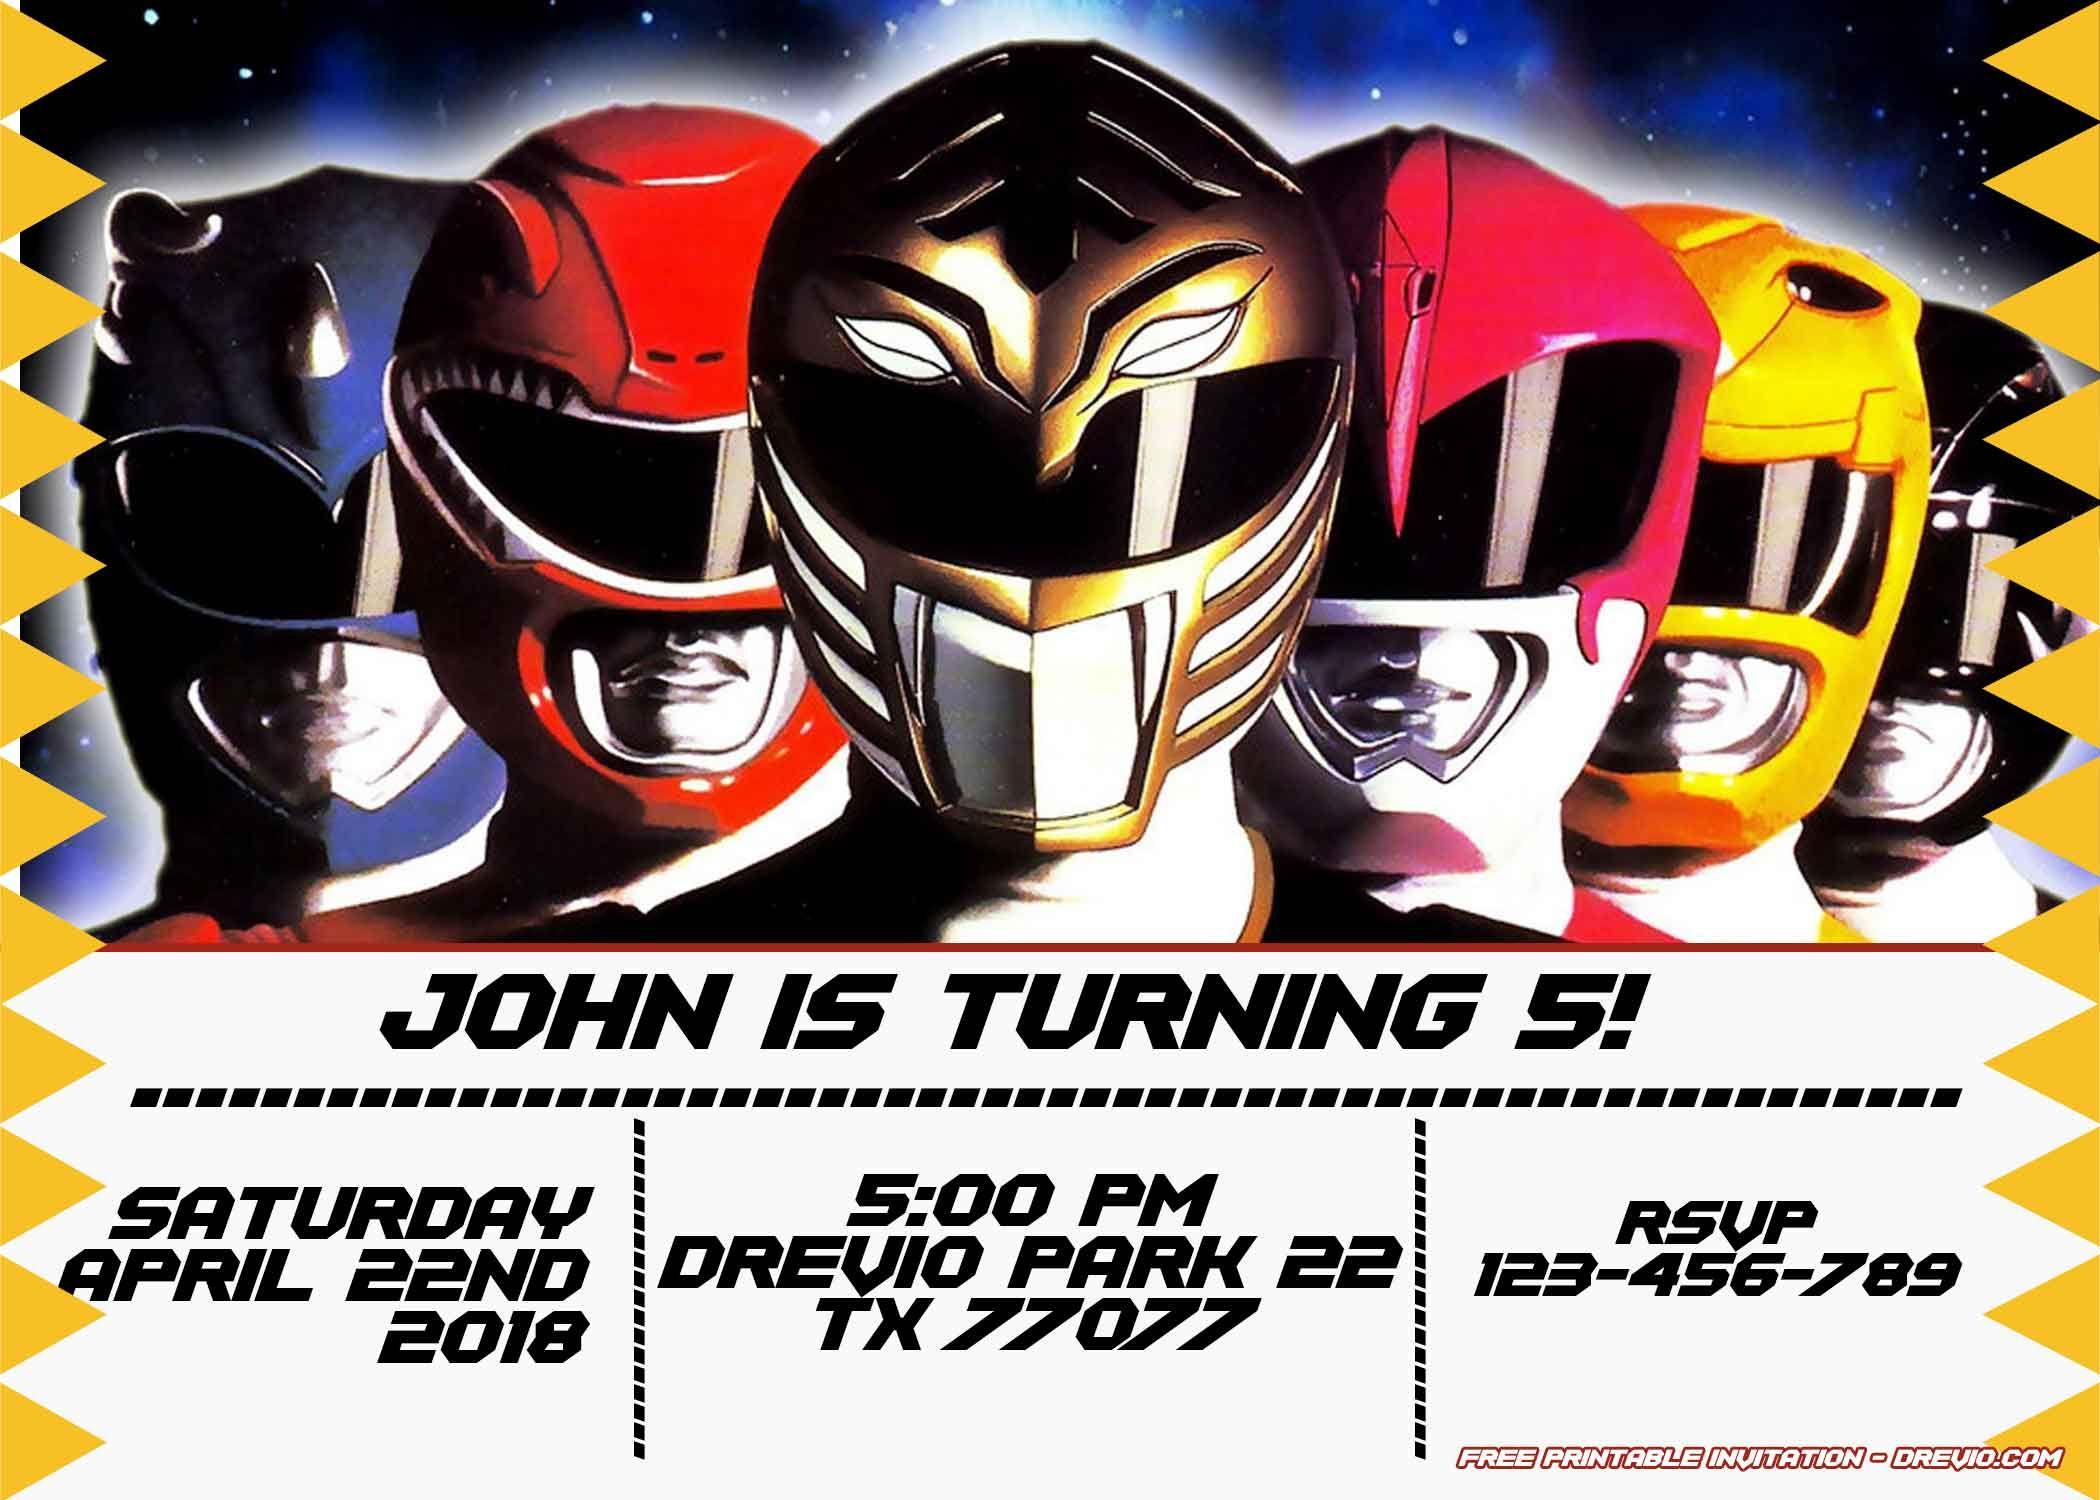 Free Power Rangers Birthday Invitation   Life's A Party - Free Printable Power Ranger Birthday Invitations